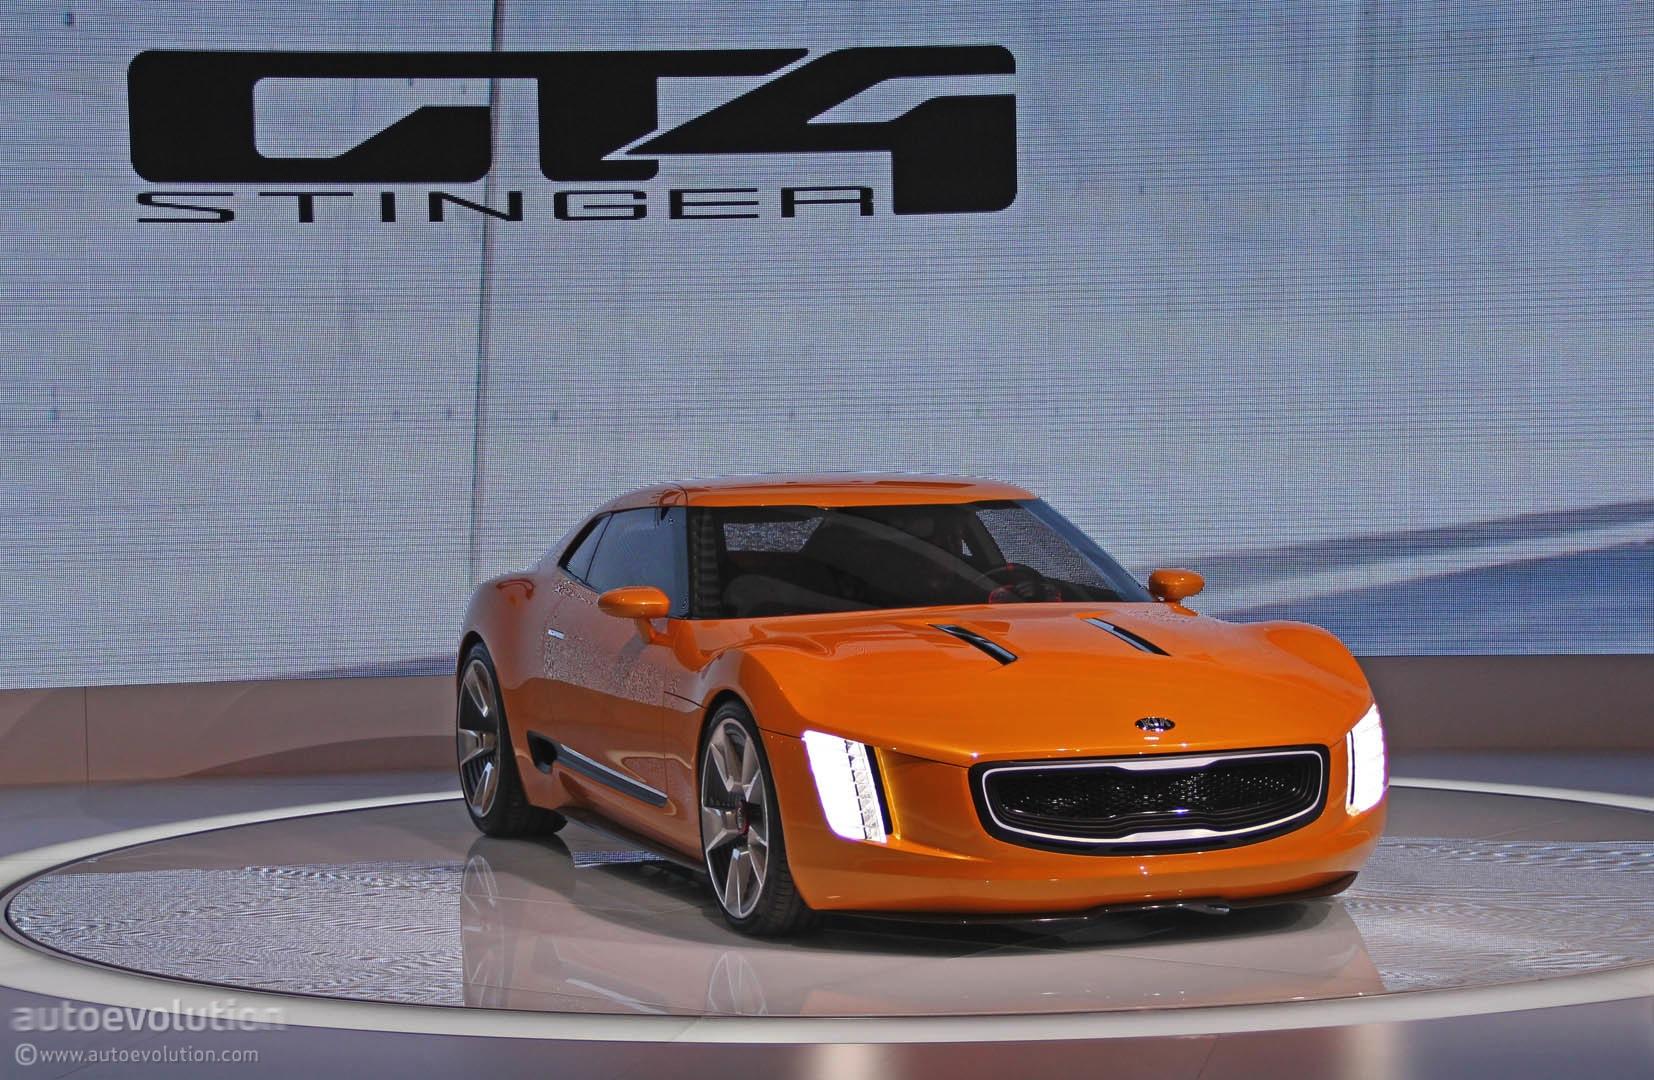 Kia Gt4 Stinger Might Enter Production By 2016 Autoevolution